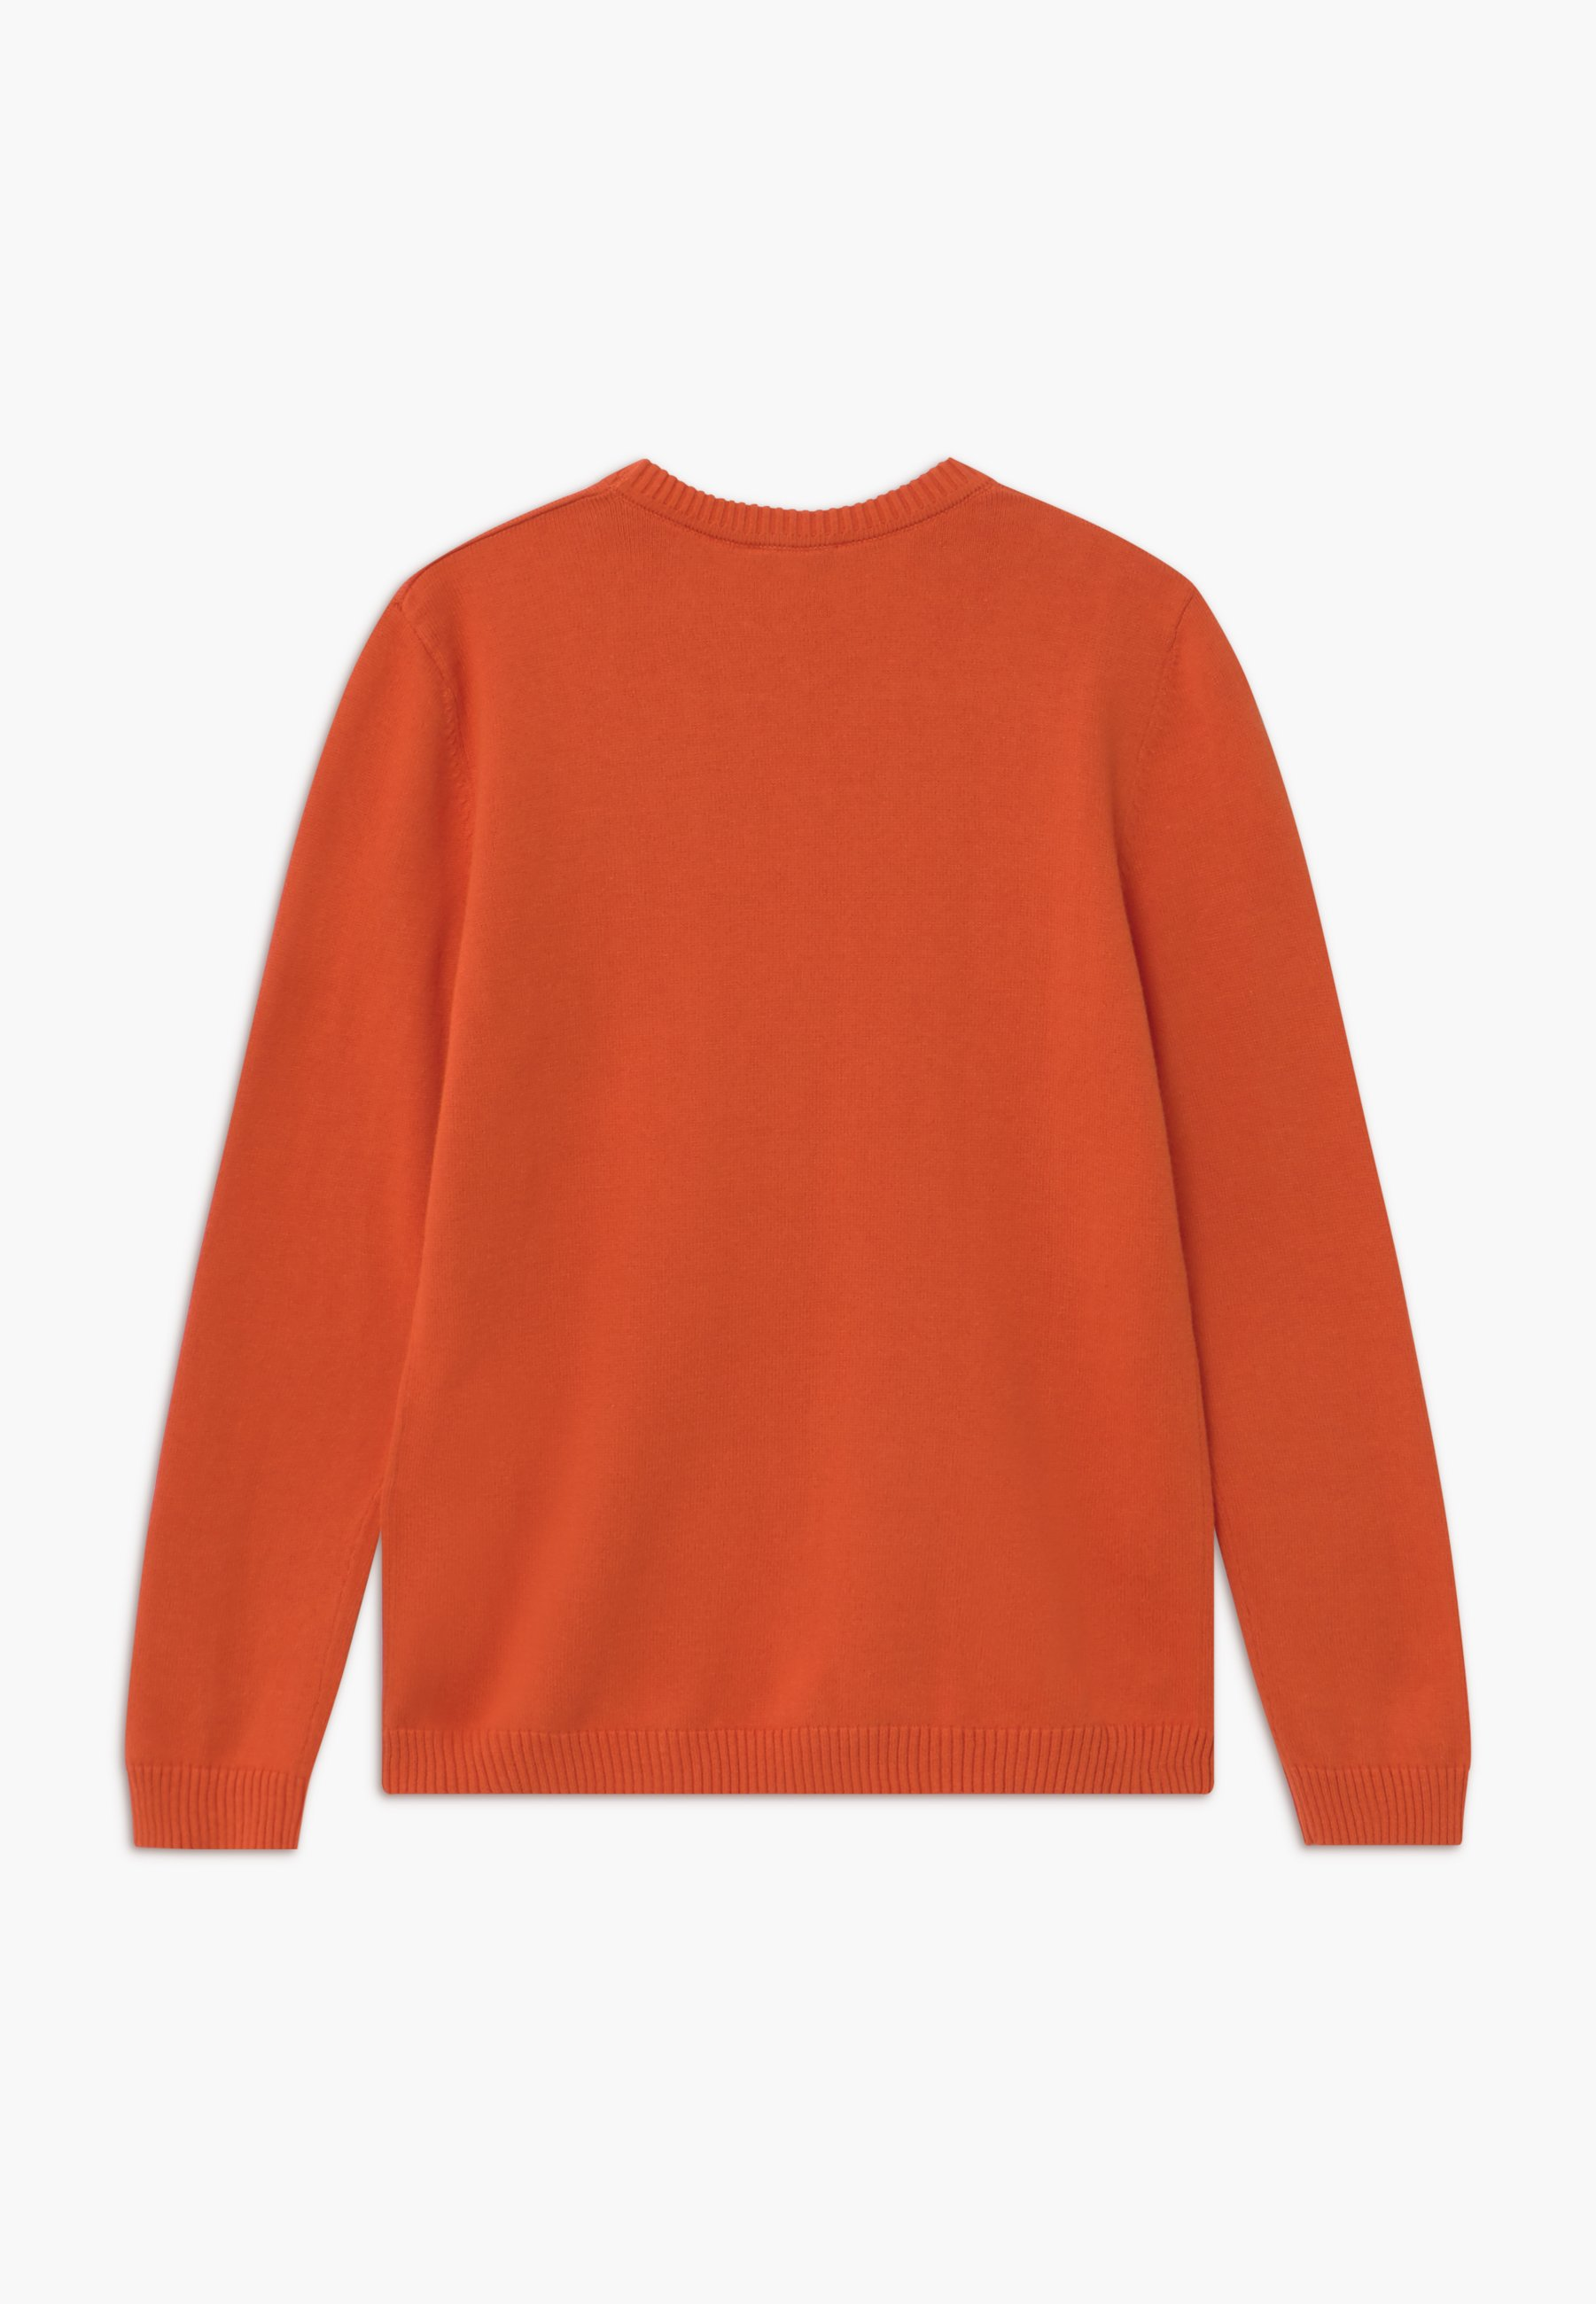 Pull orange de Benetton chez Zalando